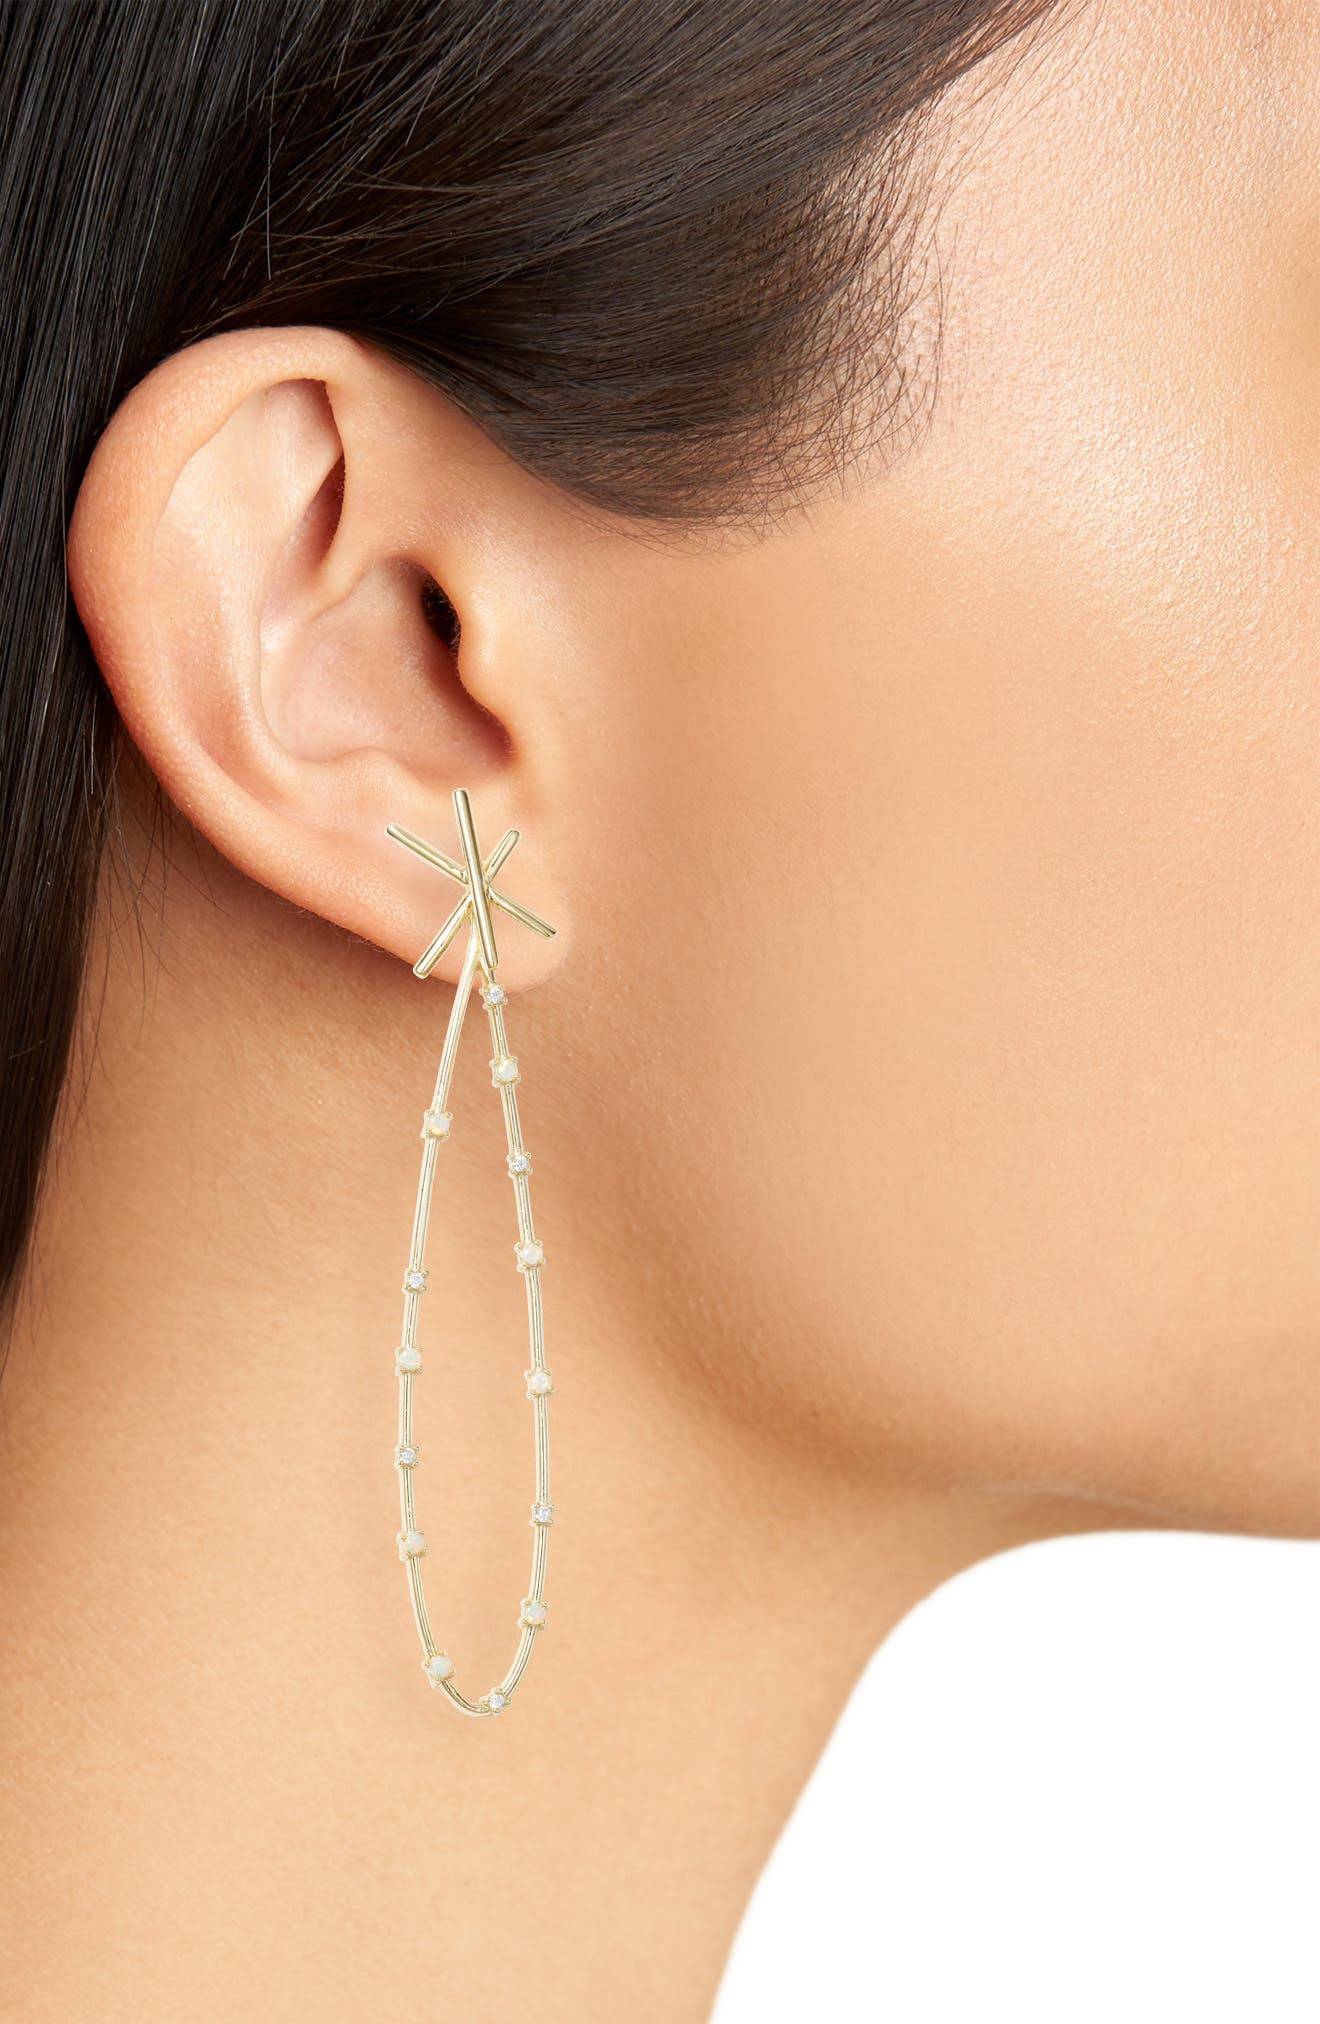 Rose Drop Opal Earring Jackets,                             Alternate thumbnail 2, color,                             White Opal/ Gold